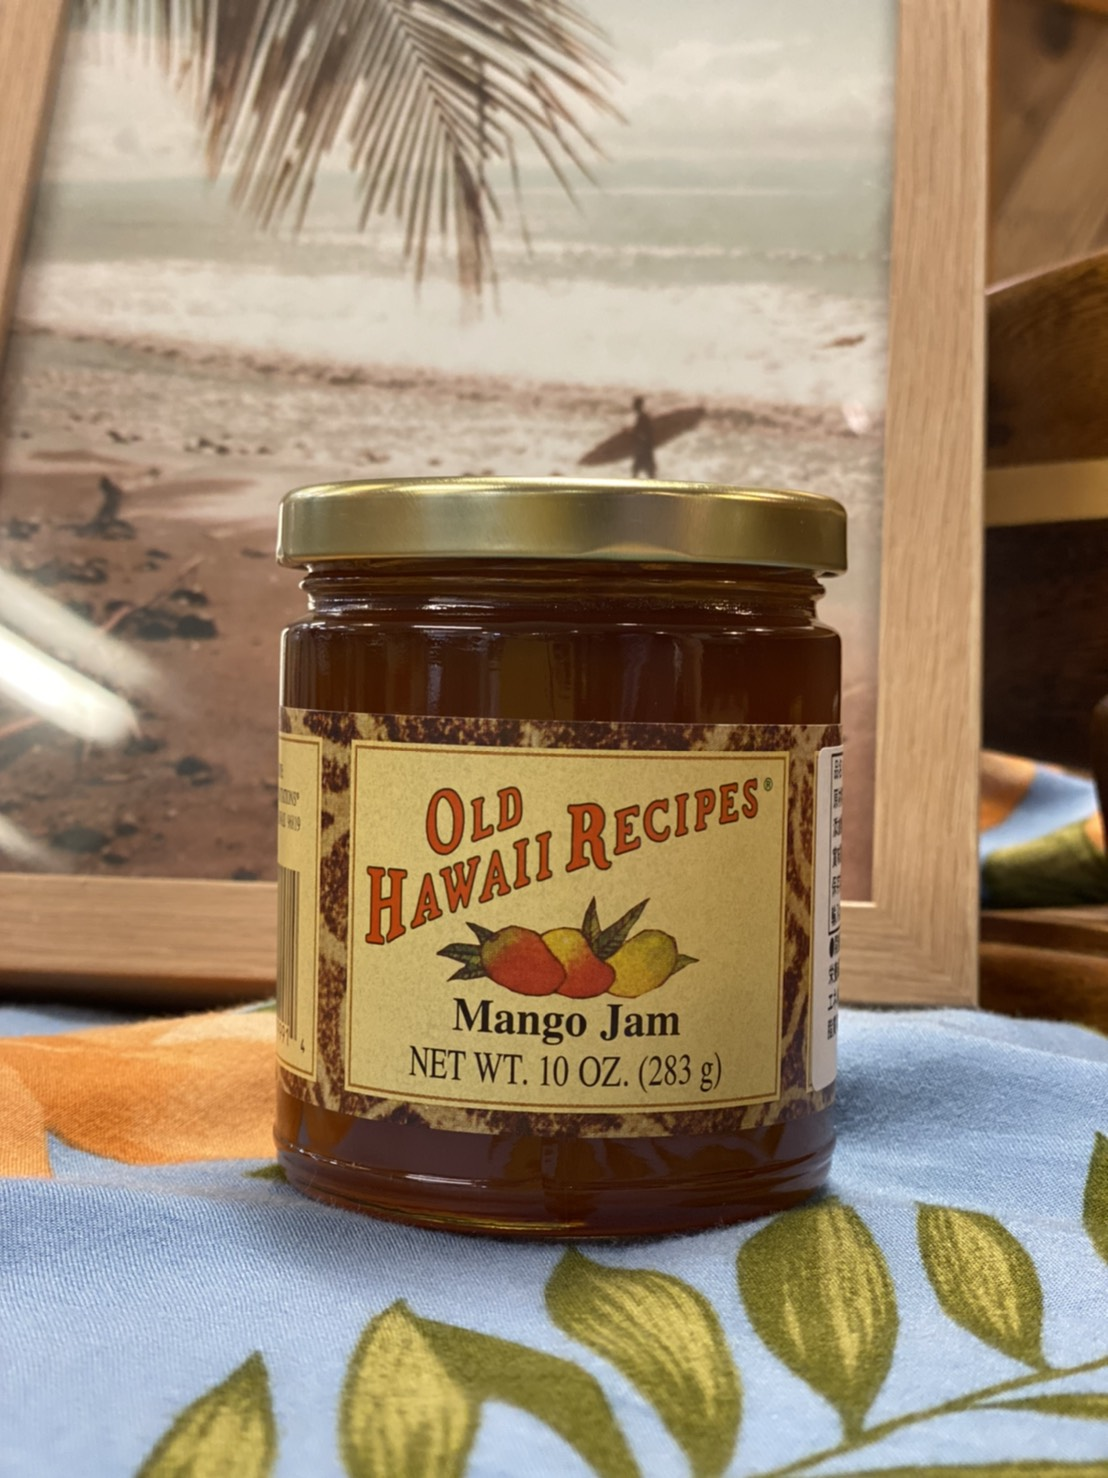 【Old Hawaii Recipes】 マンゴー ジャム 283g